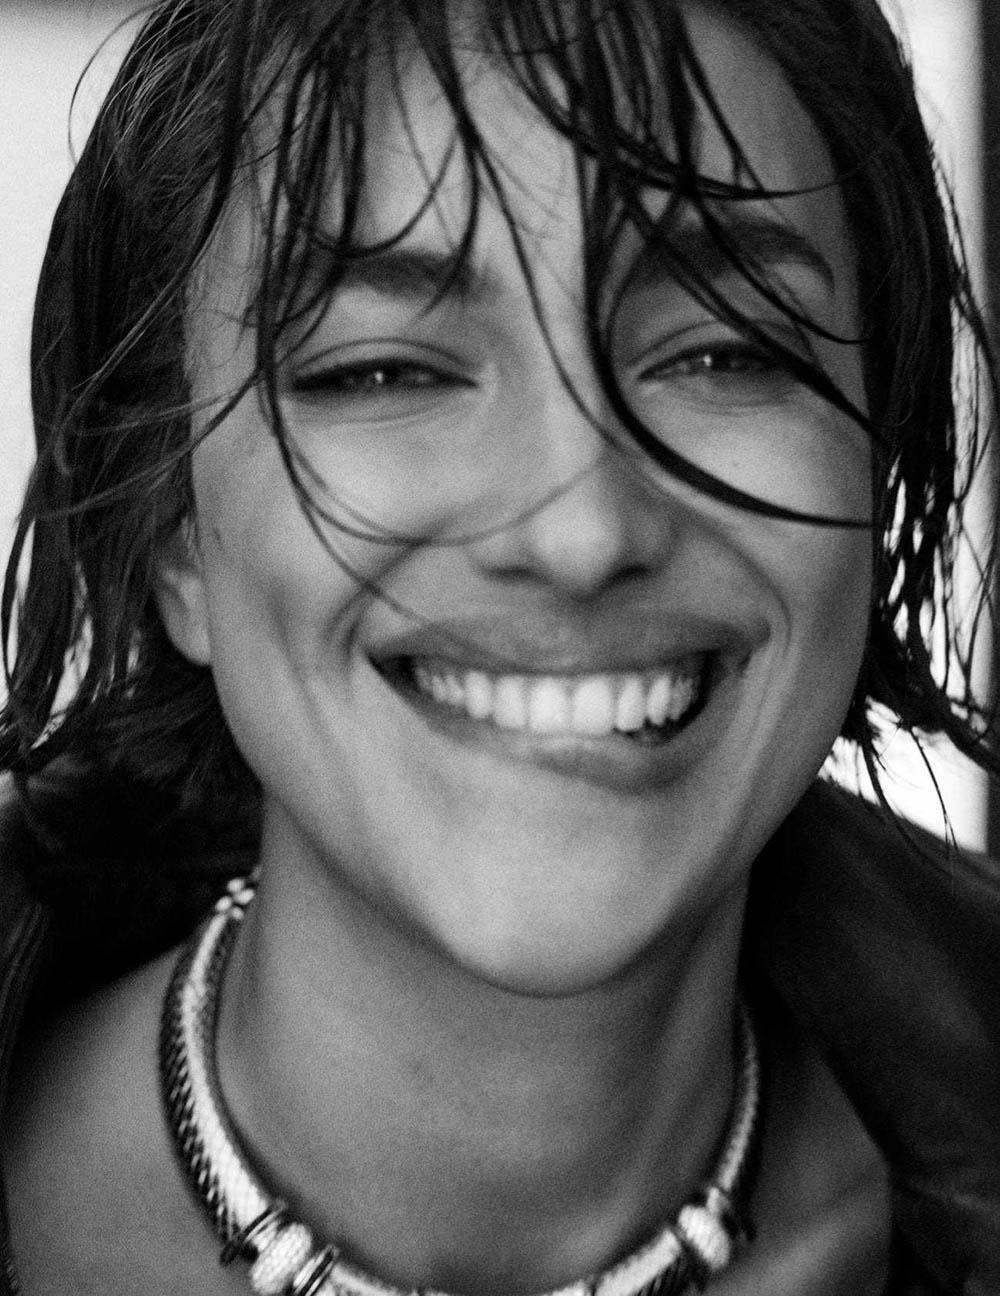 Irina Shayk covers Vogue Spain September 2018 by Giampaolo Sgura